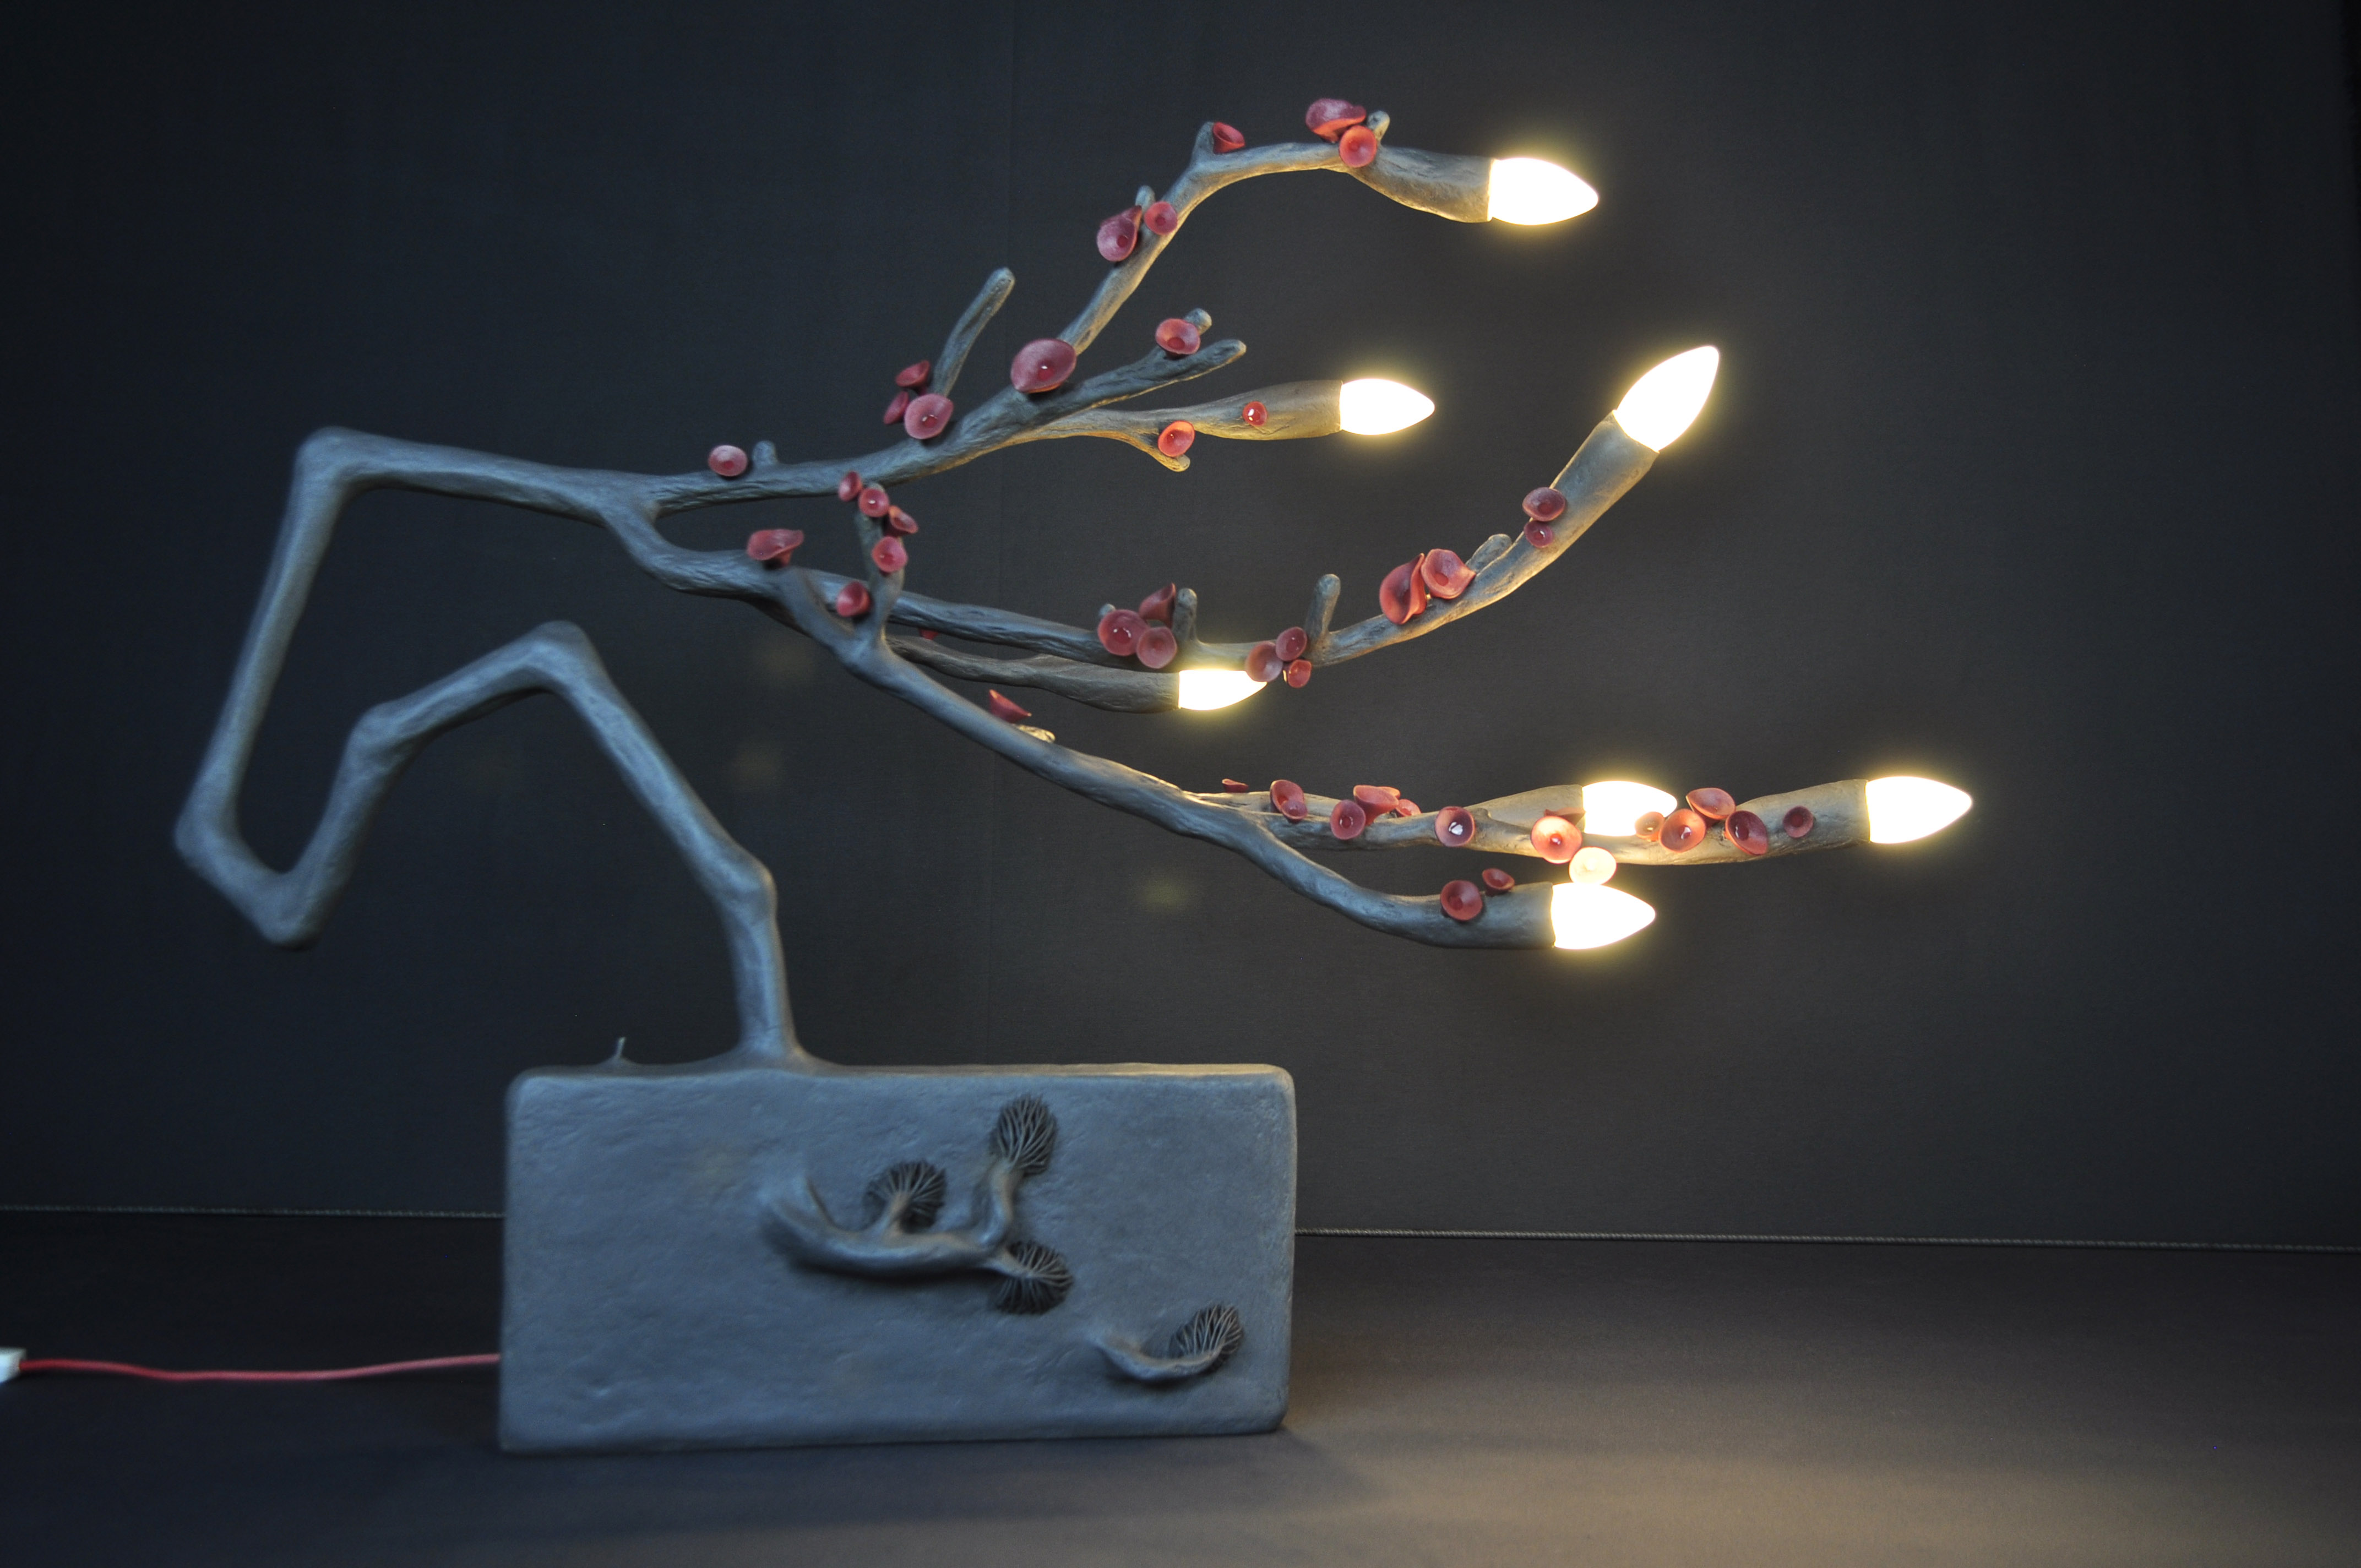 Un soir, un cerisier